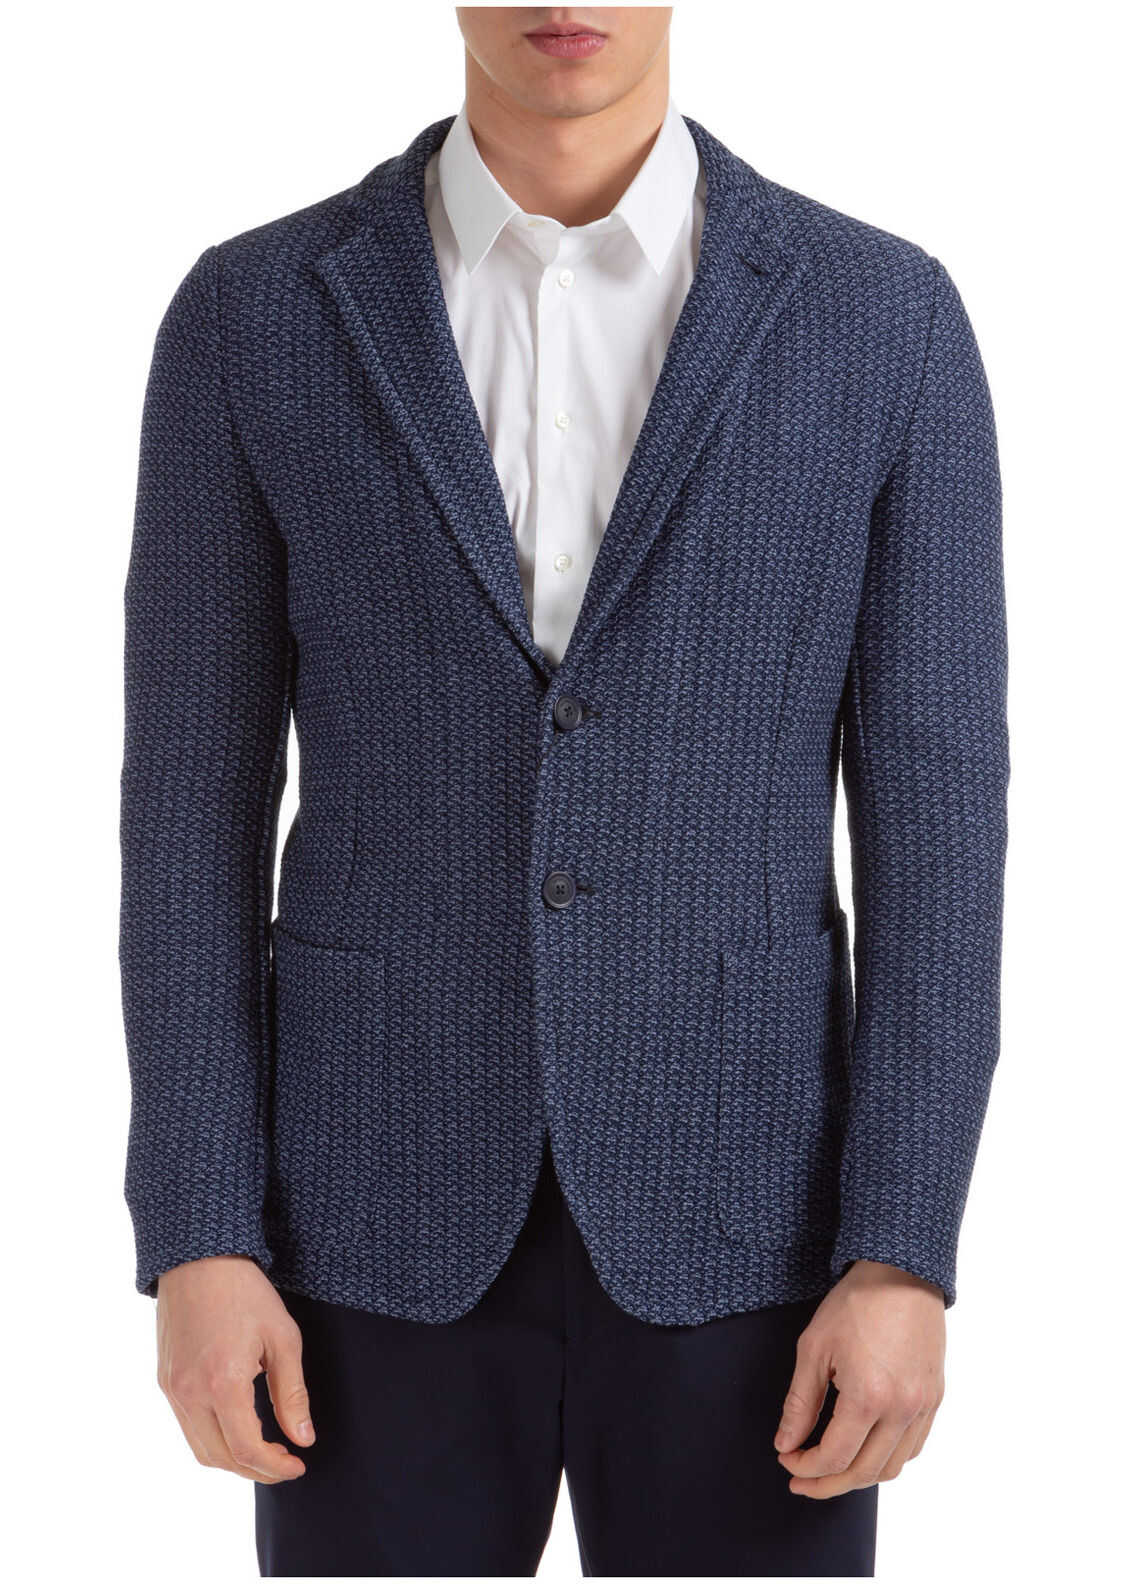 Emporio Armani Jacket Blazer Light blue imagine